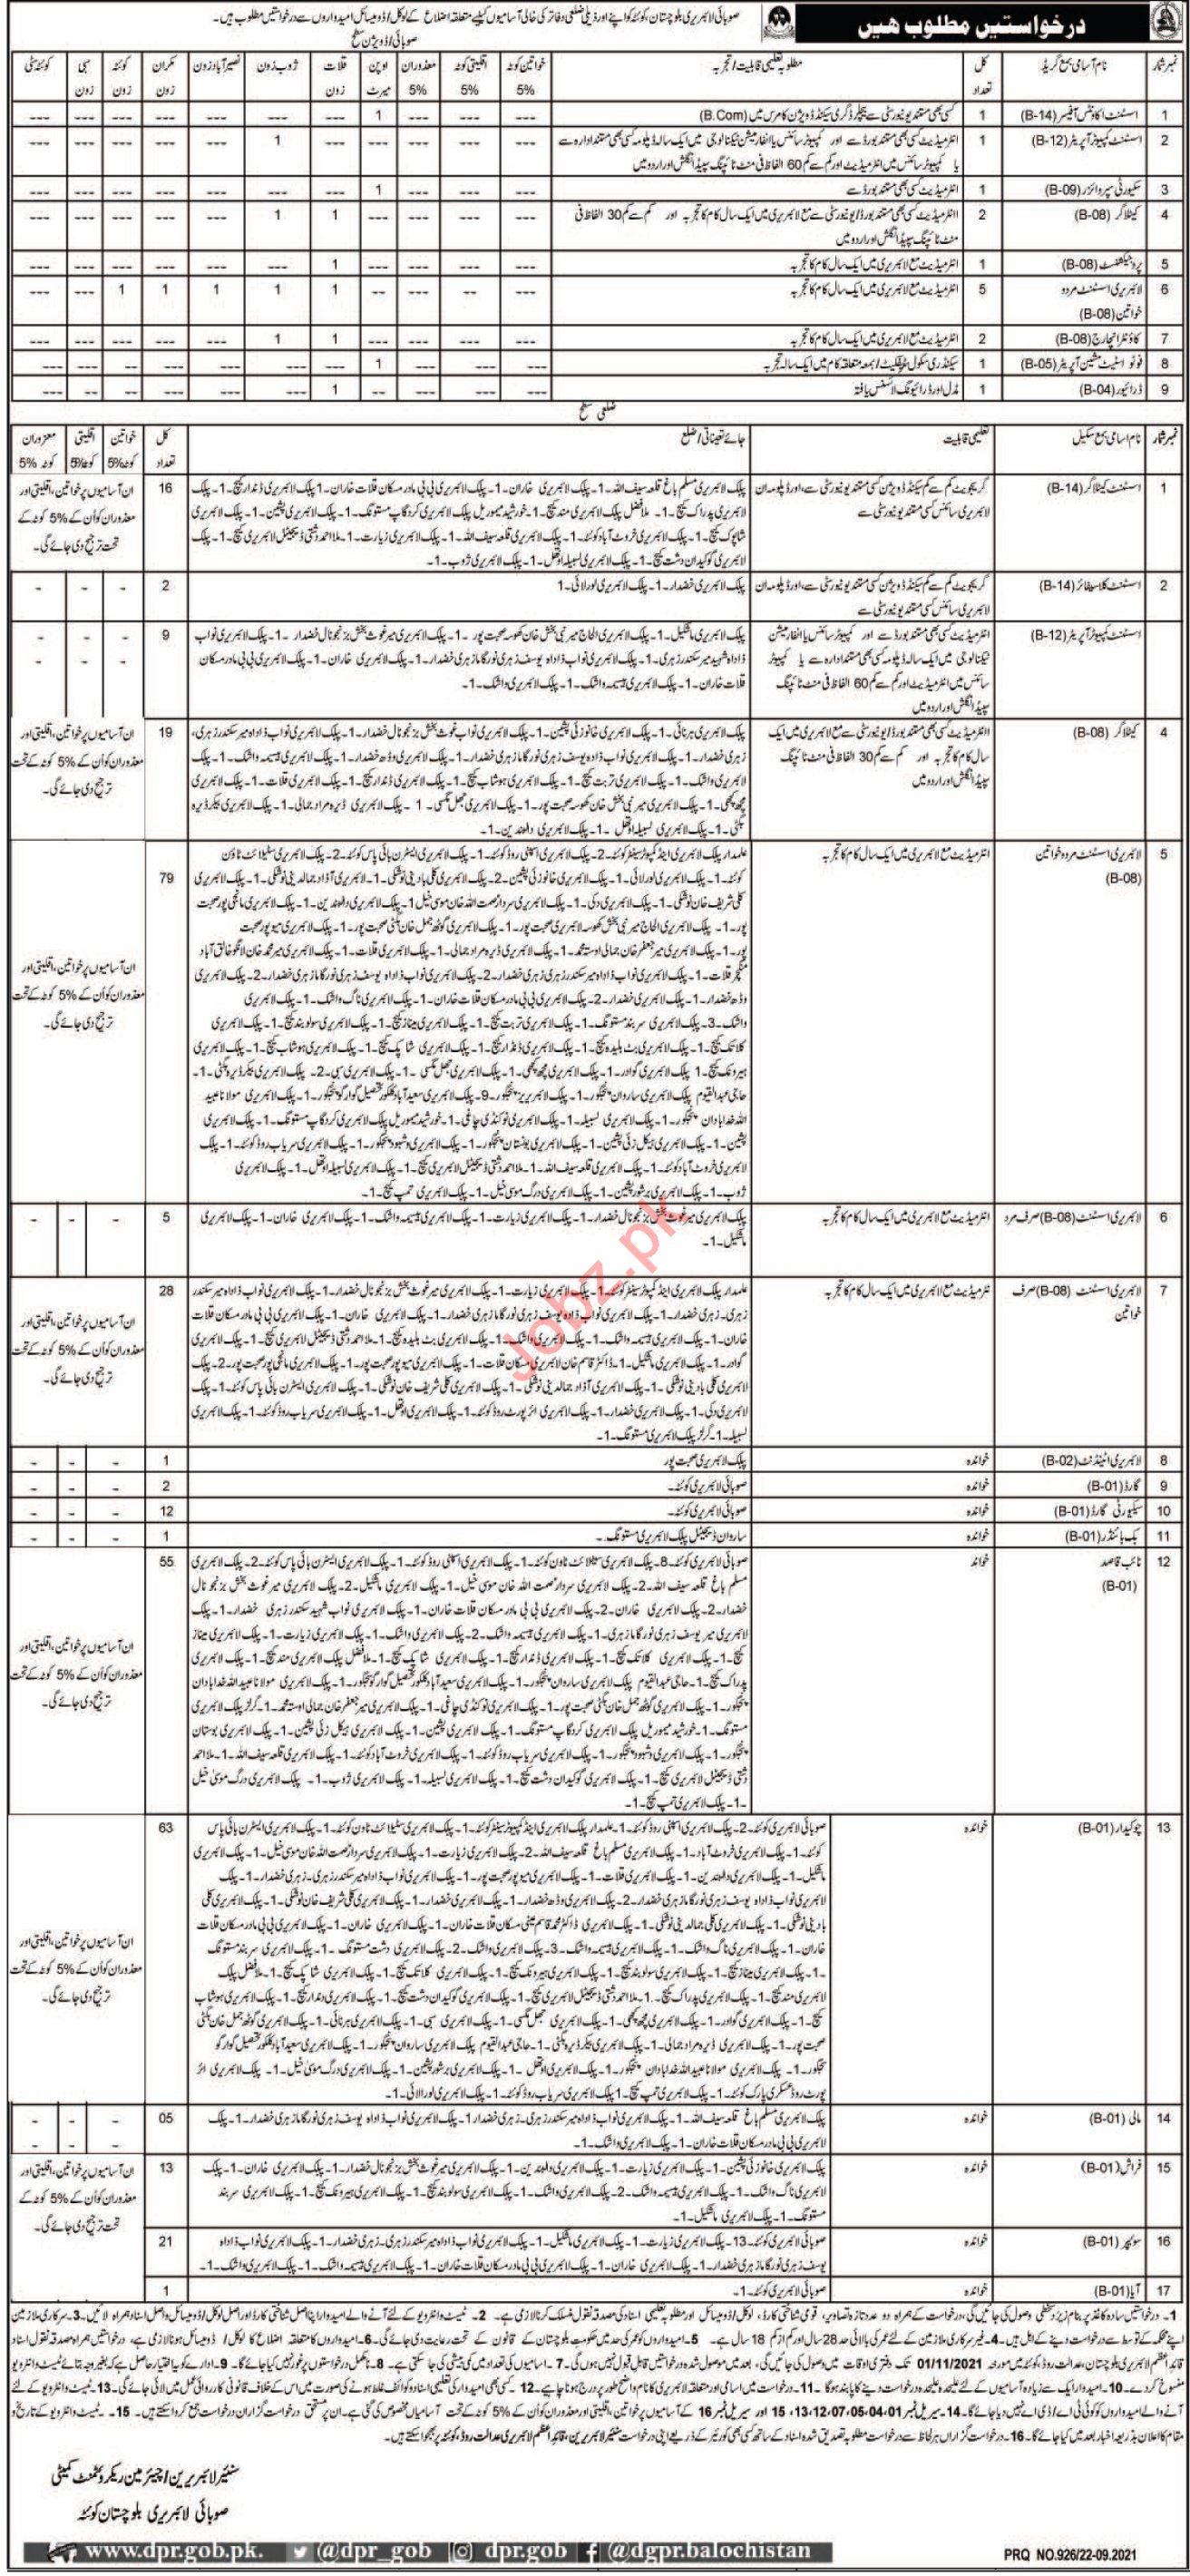 Provincial Library Balochistan Quetta Jobs 2021 Assistants